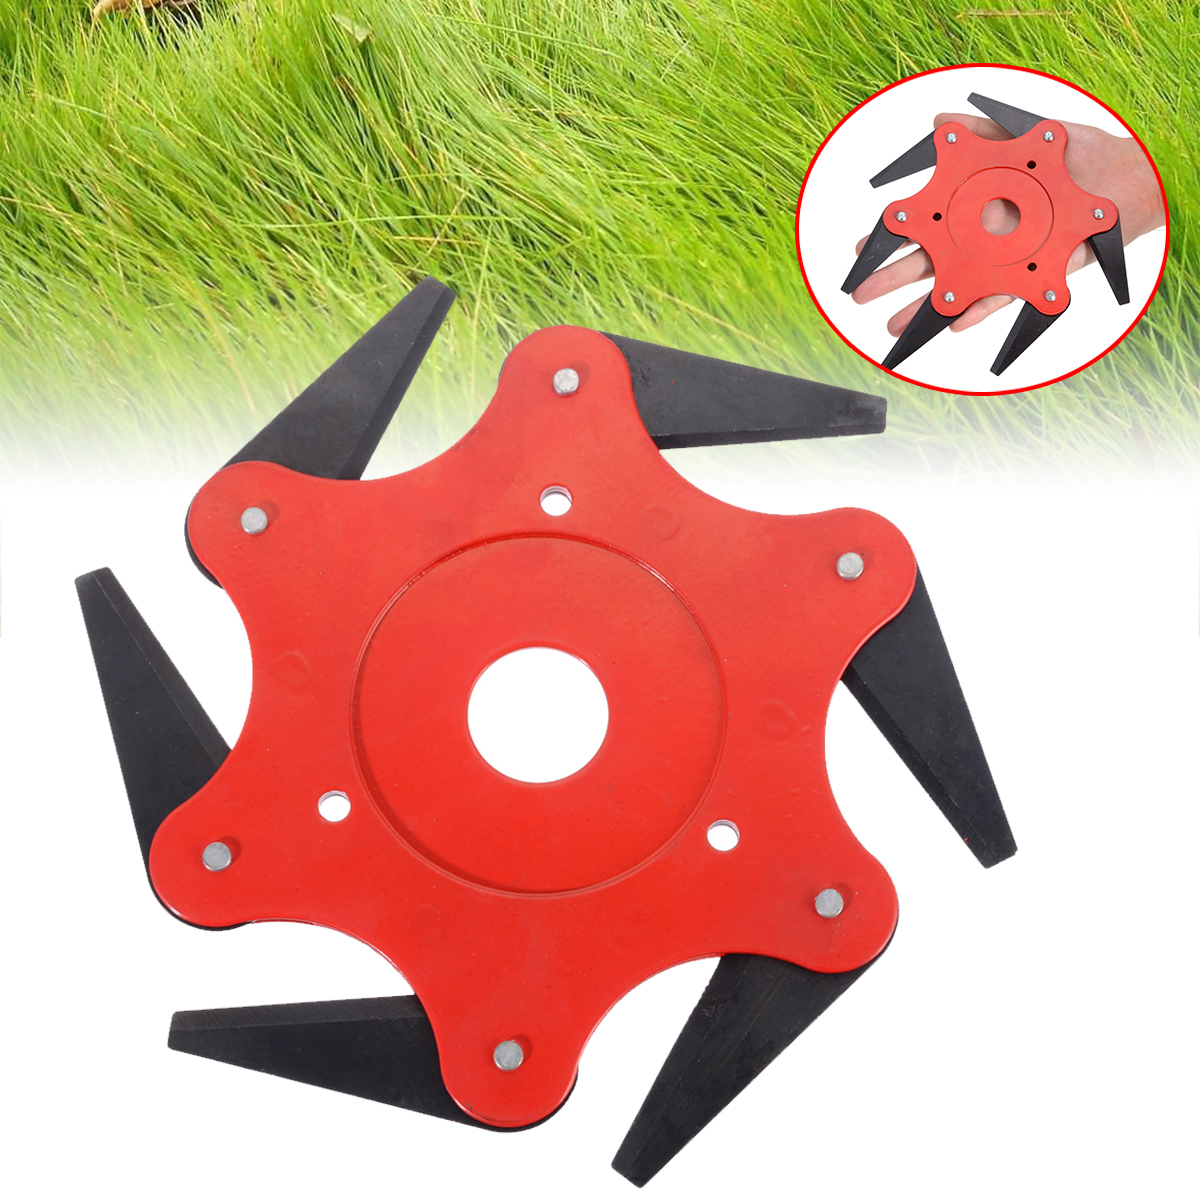 6 Blades Grass Trimmer Head 65MnBrush Cutter Weed Brush Cutting Head Easy Cutting Garden Power Tool Accessories